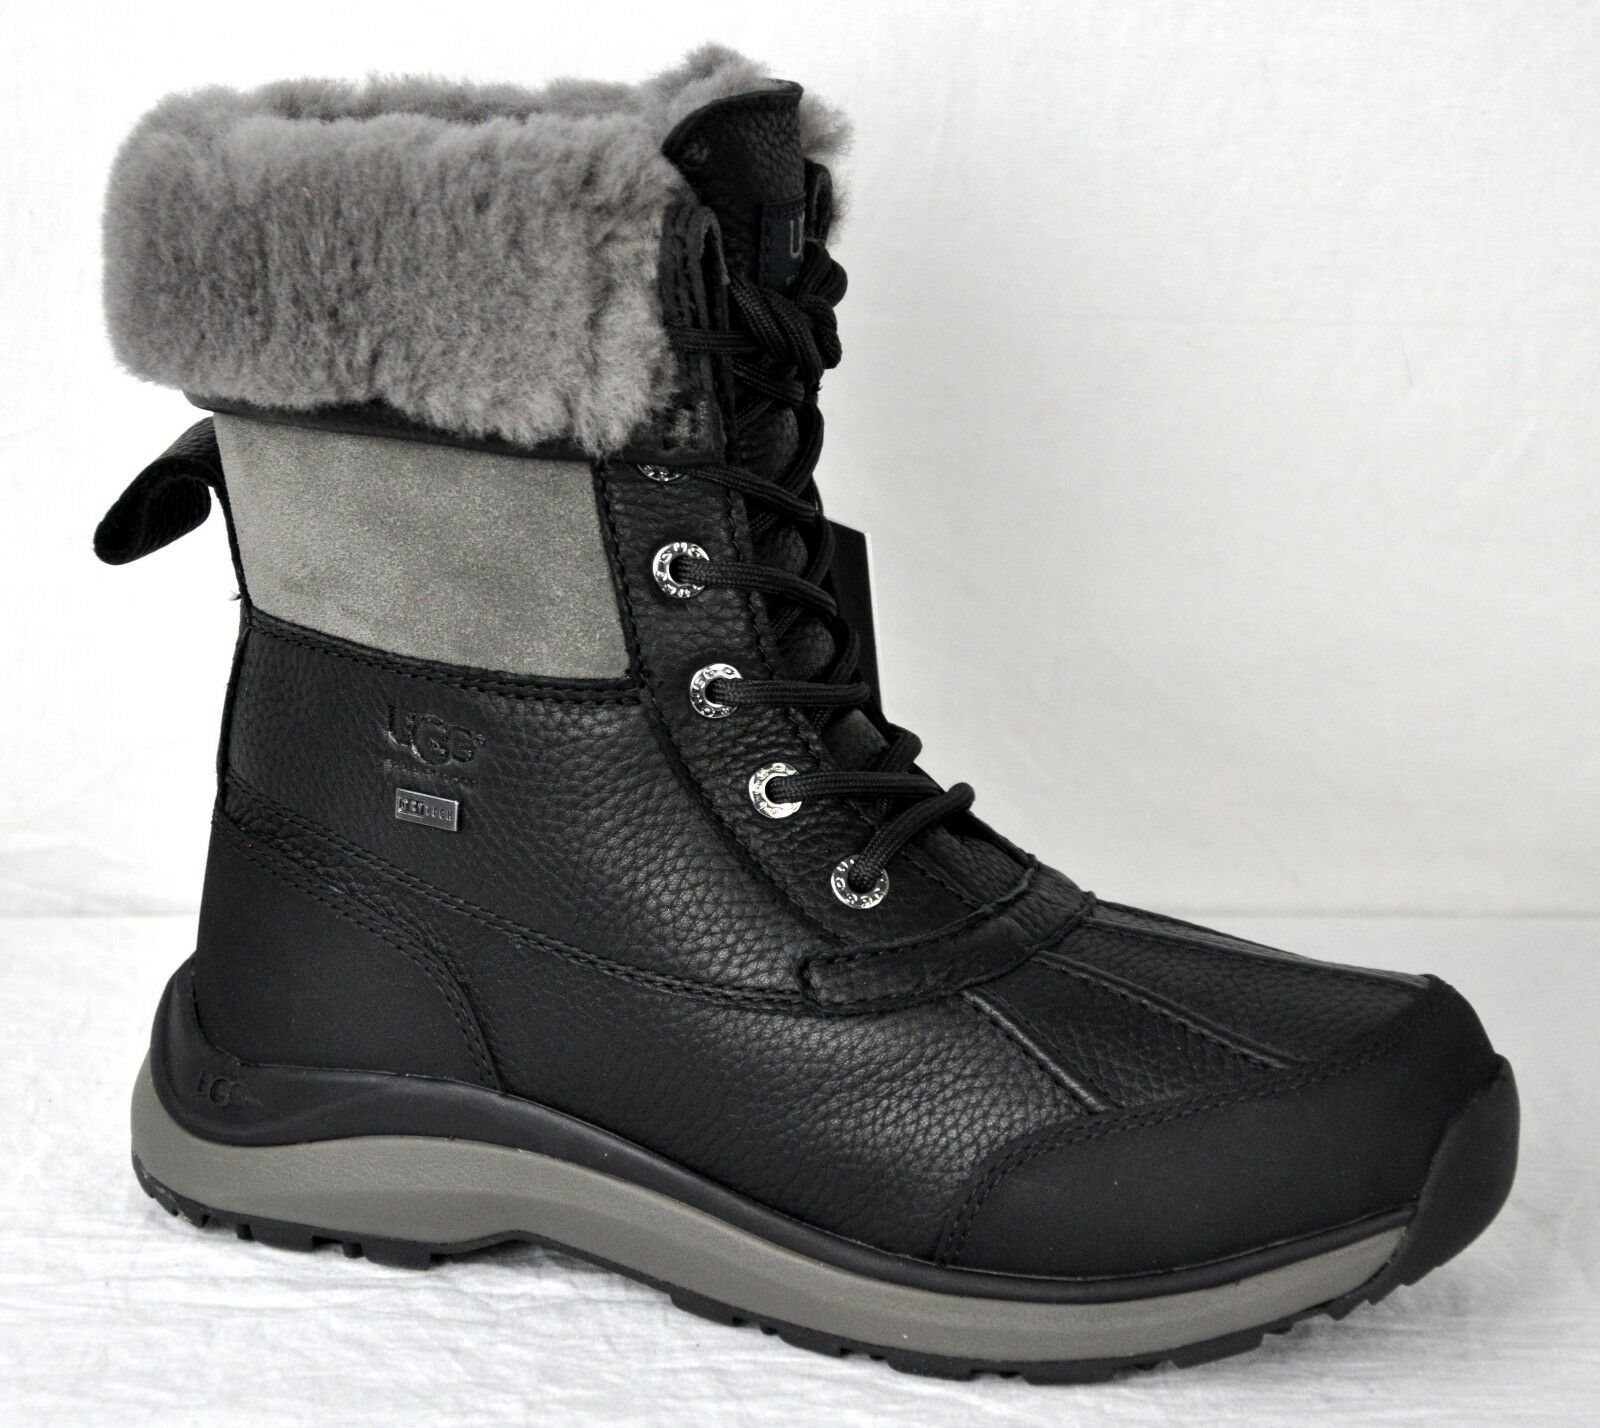 e43b4a774f4 UGG Women's Adirondack III Waterproof Snow Hiking BOOTS 1095141 Black Size 8